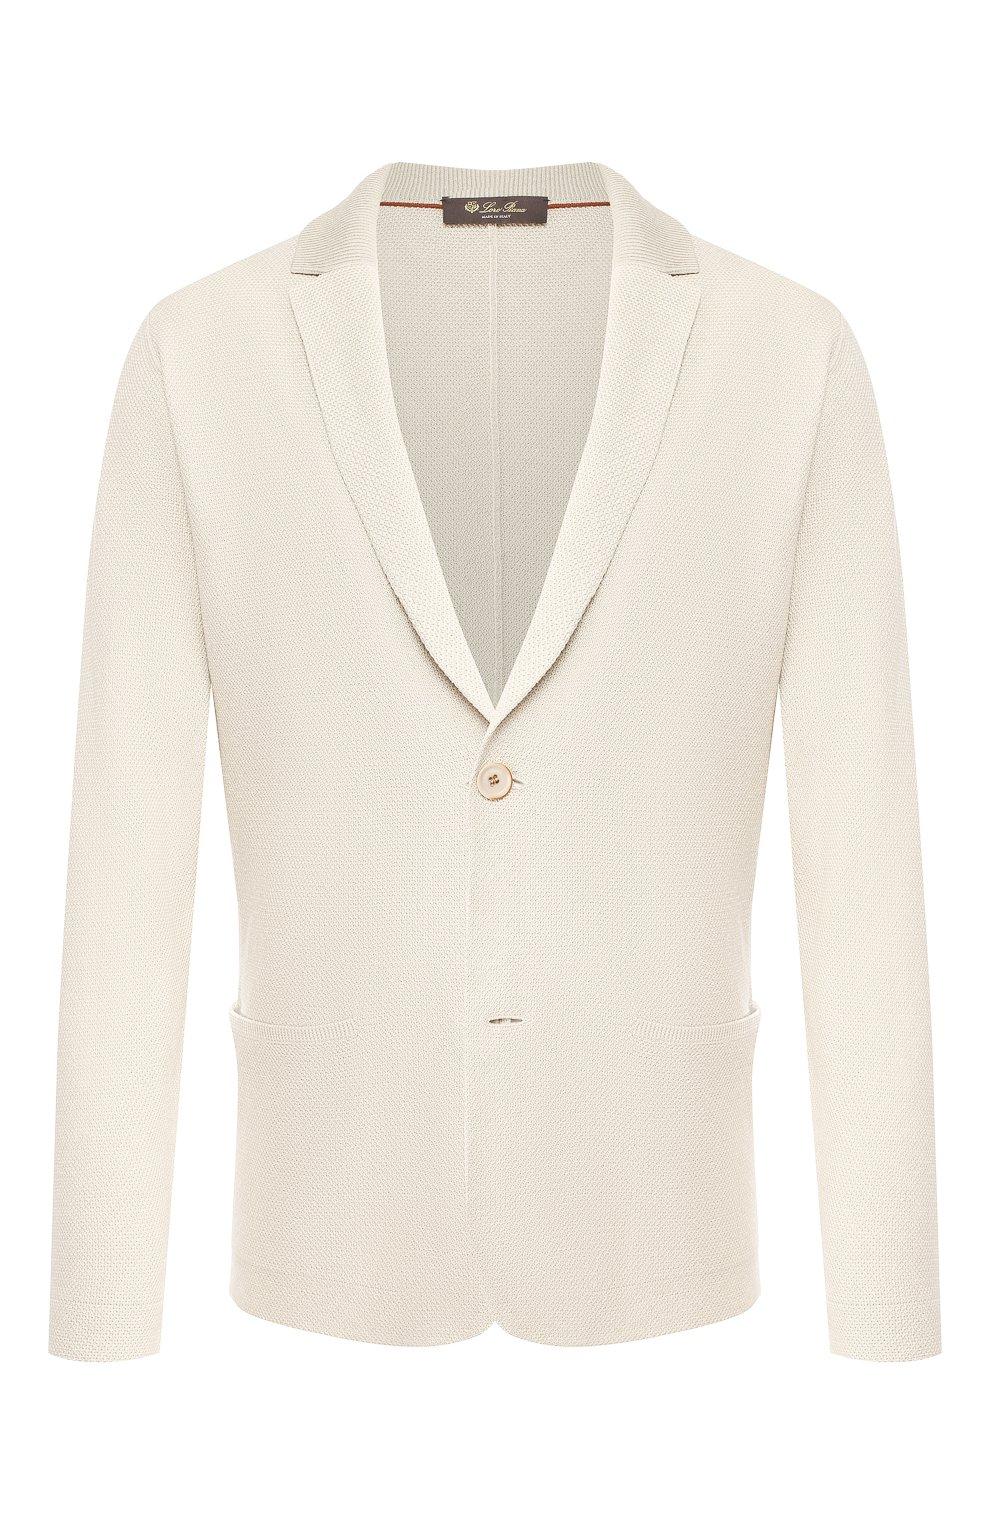 Мужской пиджак из смеси шелка и льна LORO PIANA светло-бежевого цвета, арт. FAL0061 | Фото 1